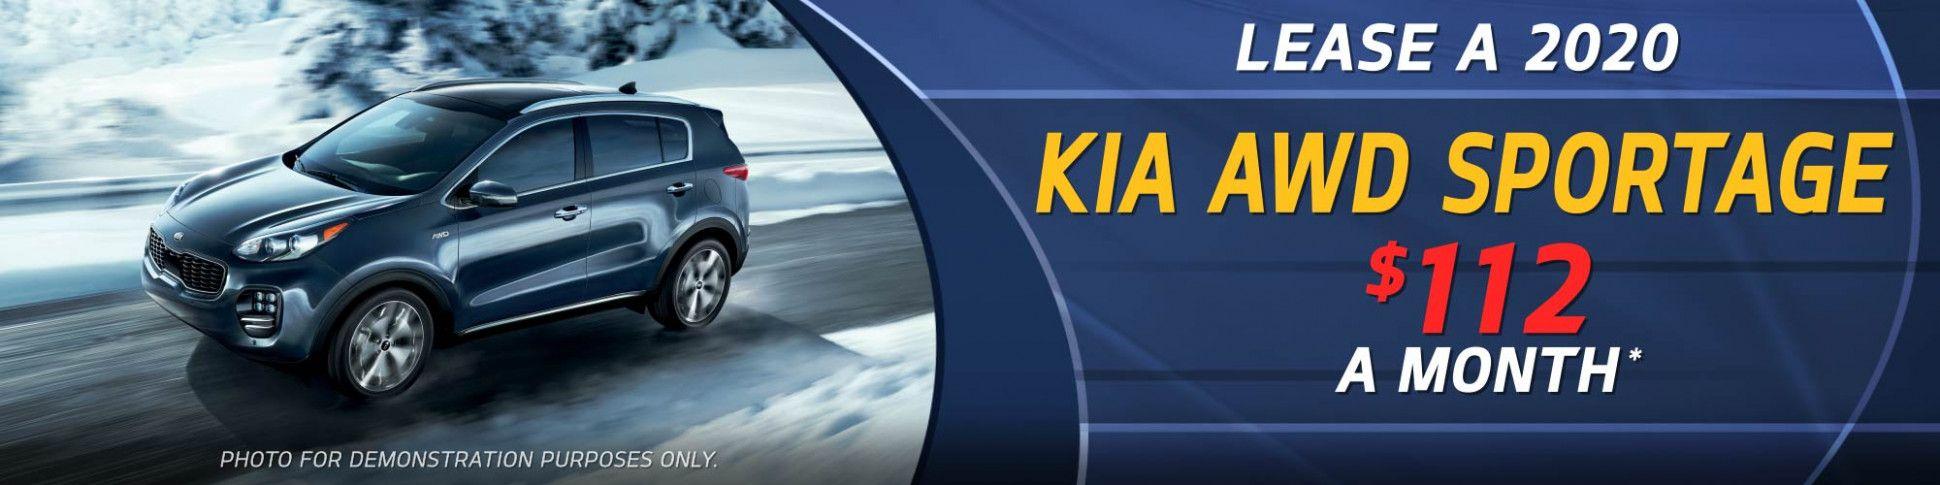 2020 Kia Lease Deals in 2020 Lease deals, Kia, Lease